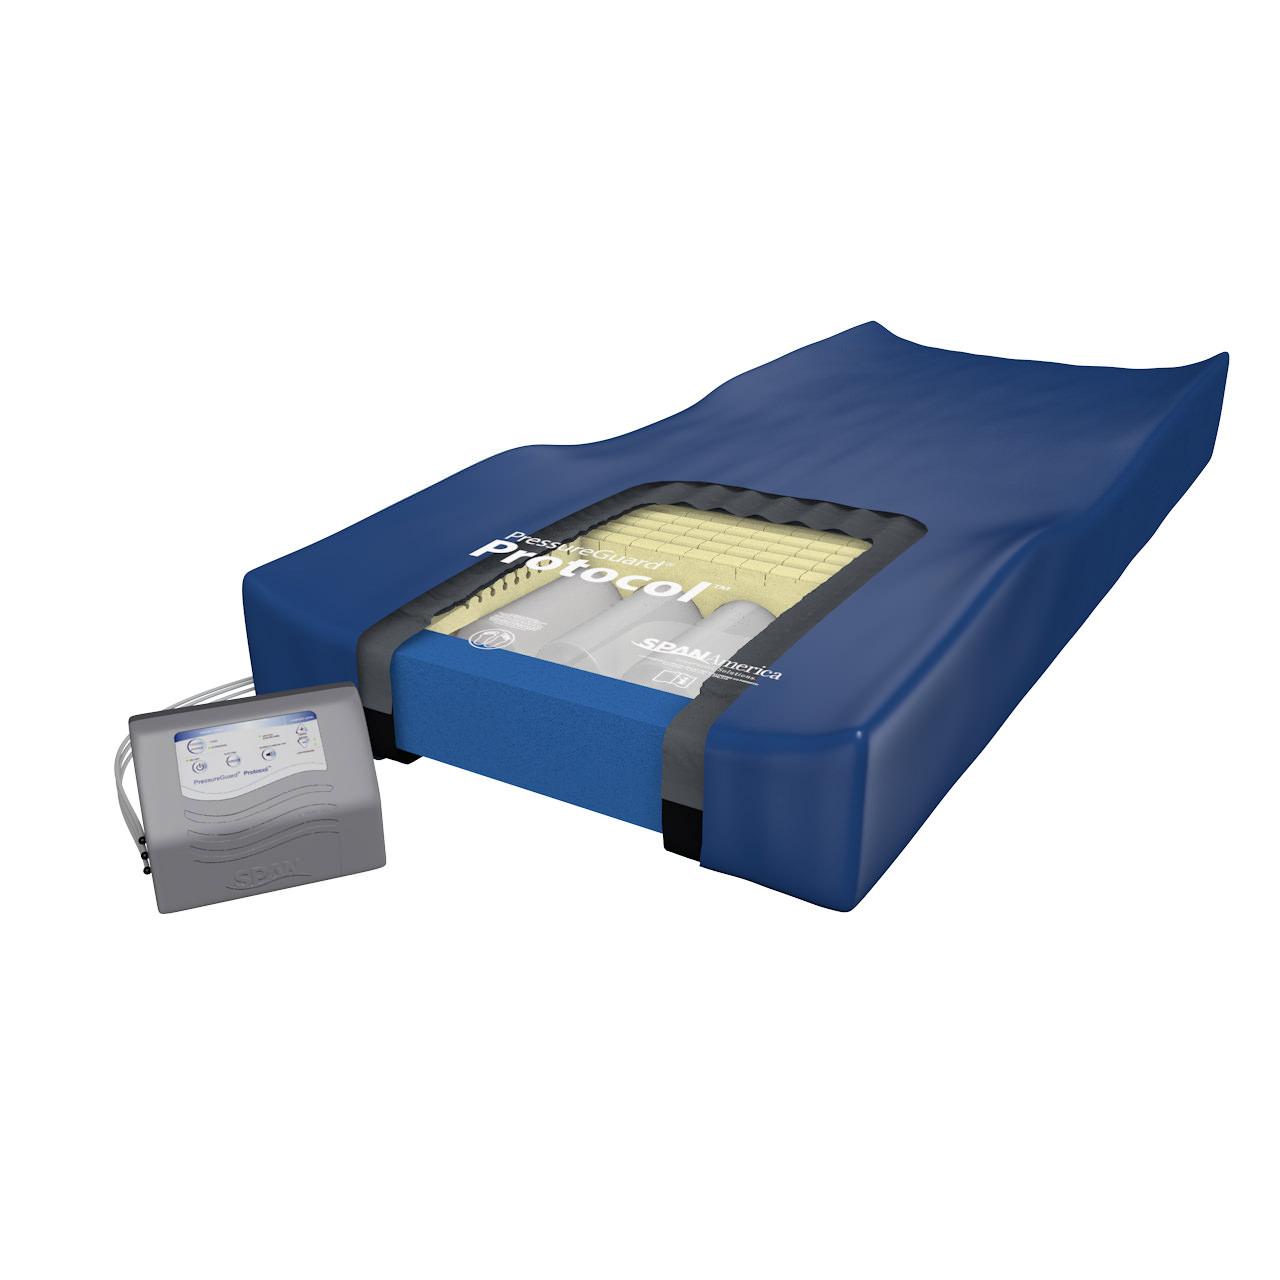 Span America PressureGuard Protocol mattress with raised edges